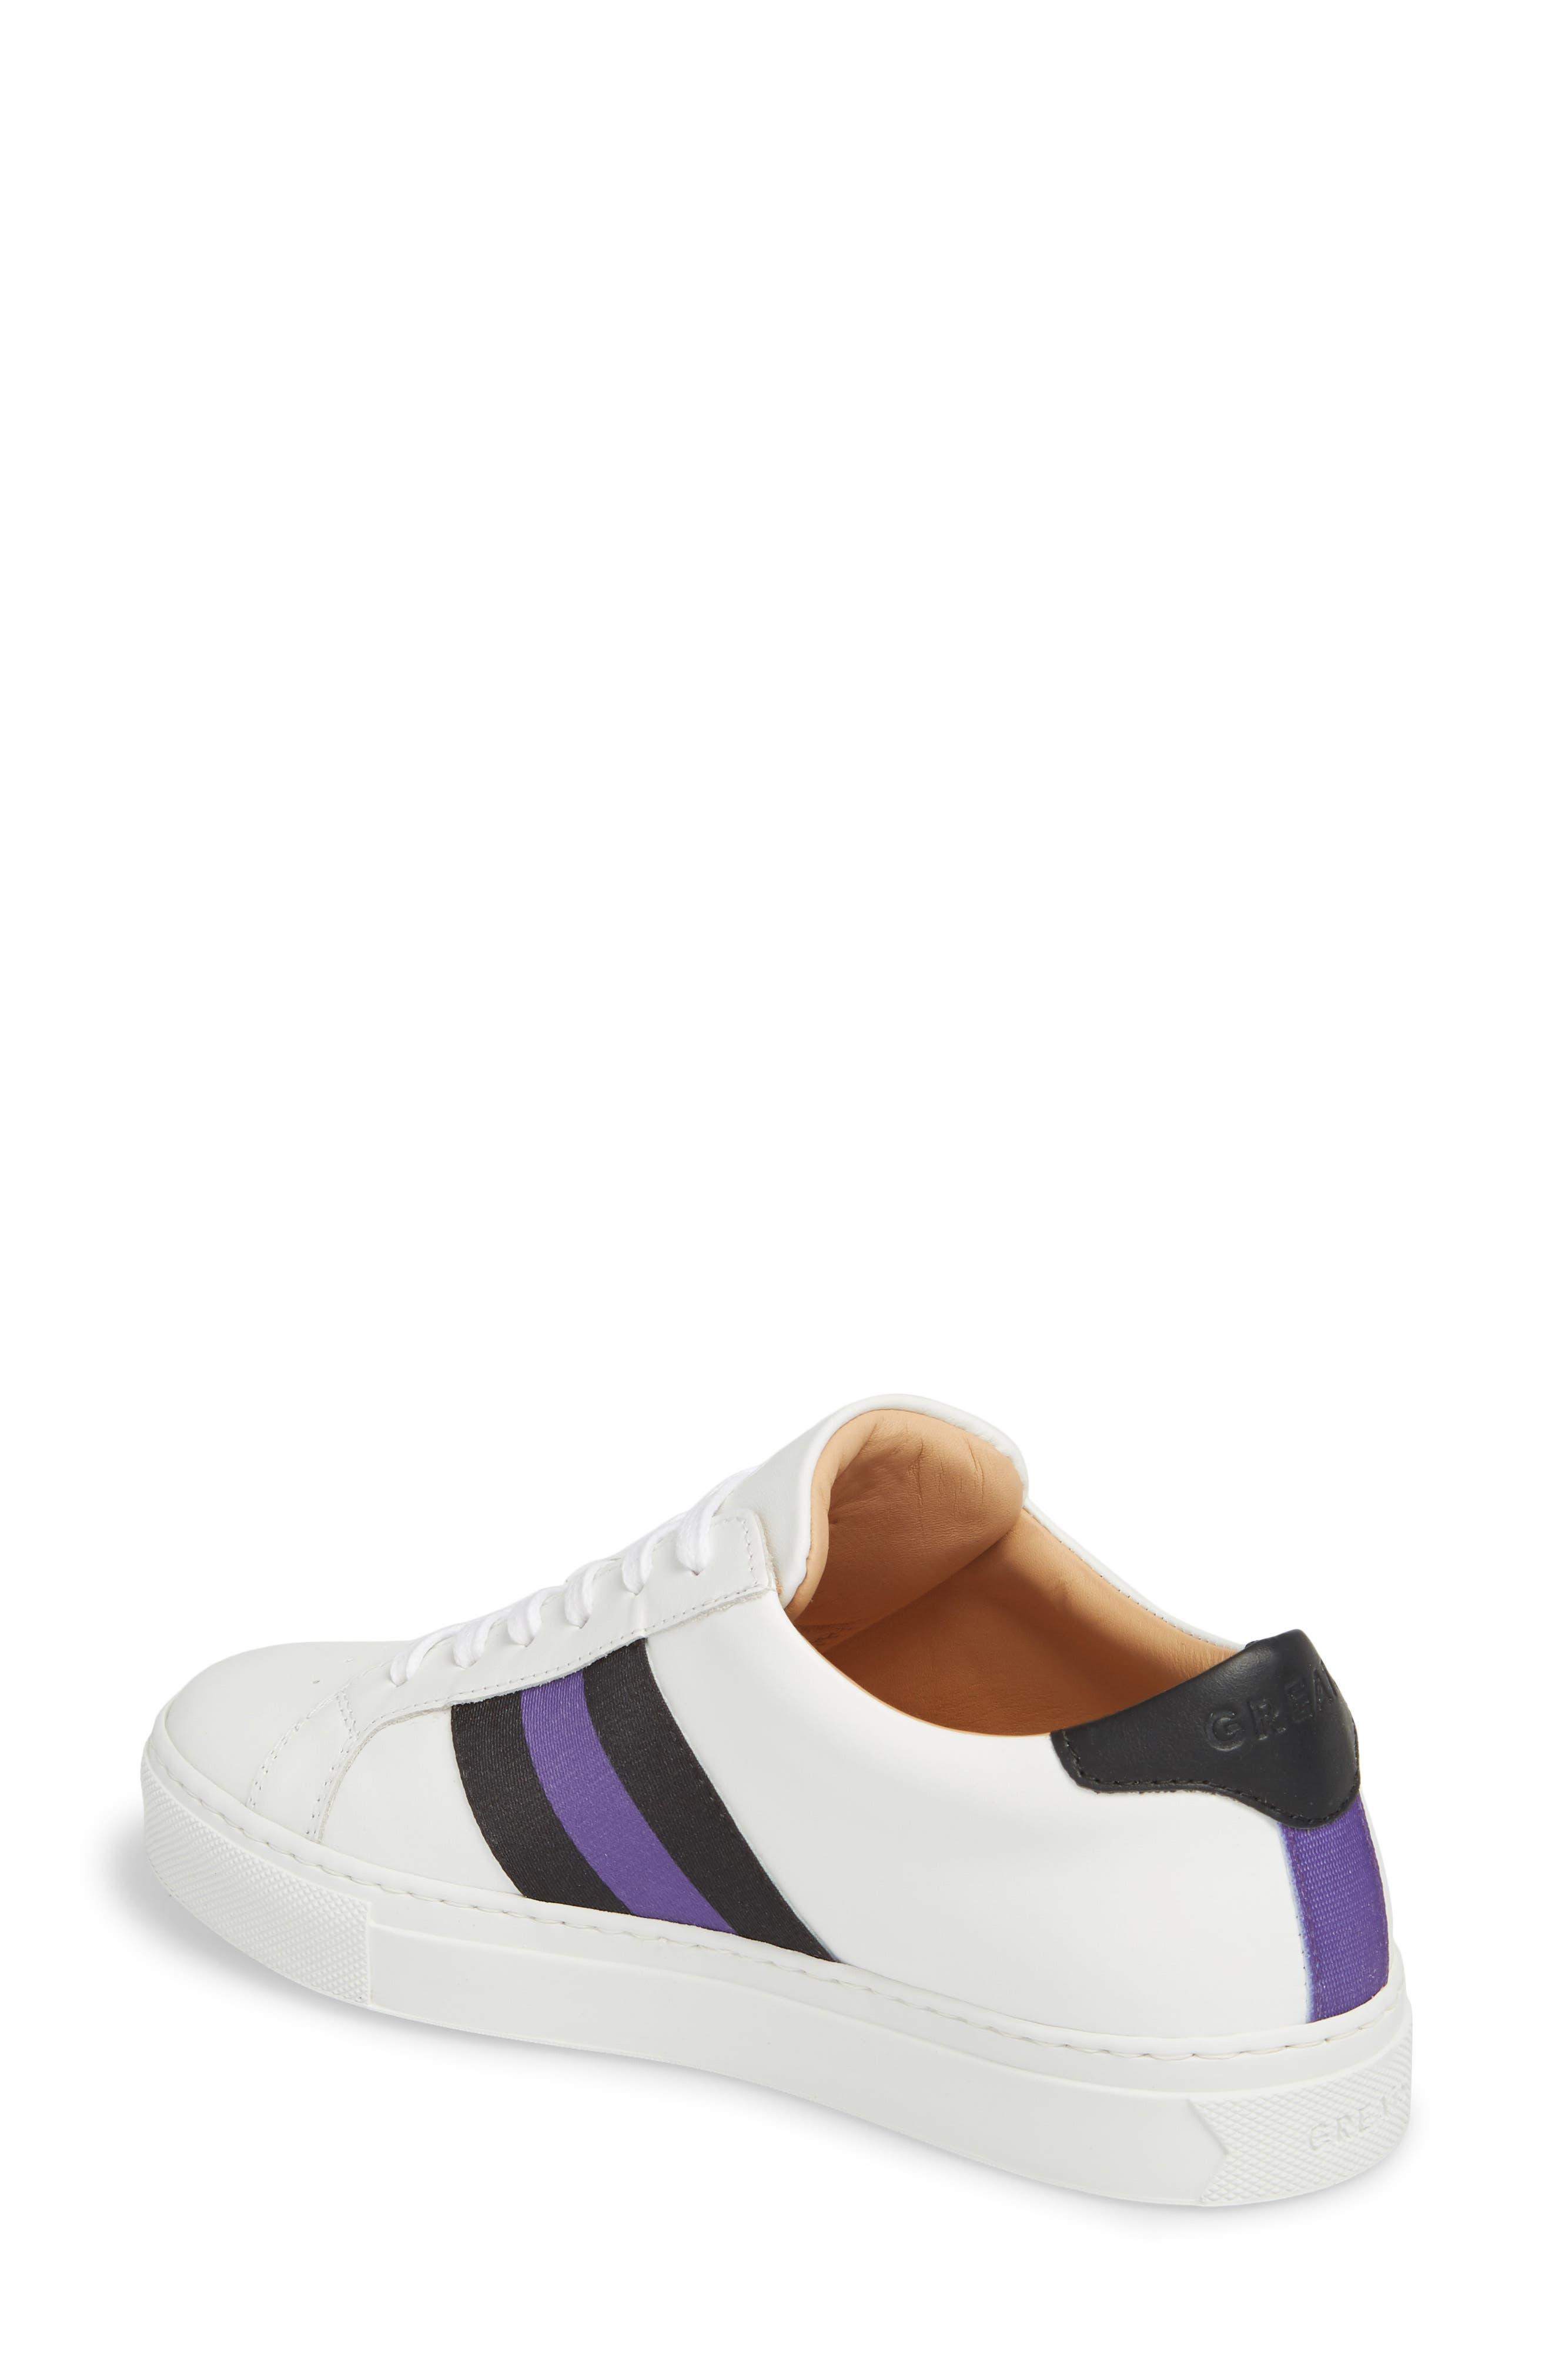 Royale Stripe Sneaker,                             Alternate thumbnail 2, color,                             WHITE/ BLACK/ VIOLET